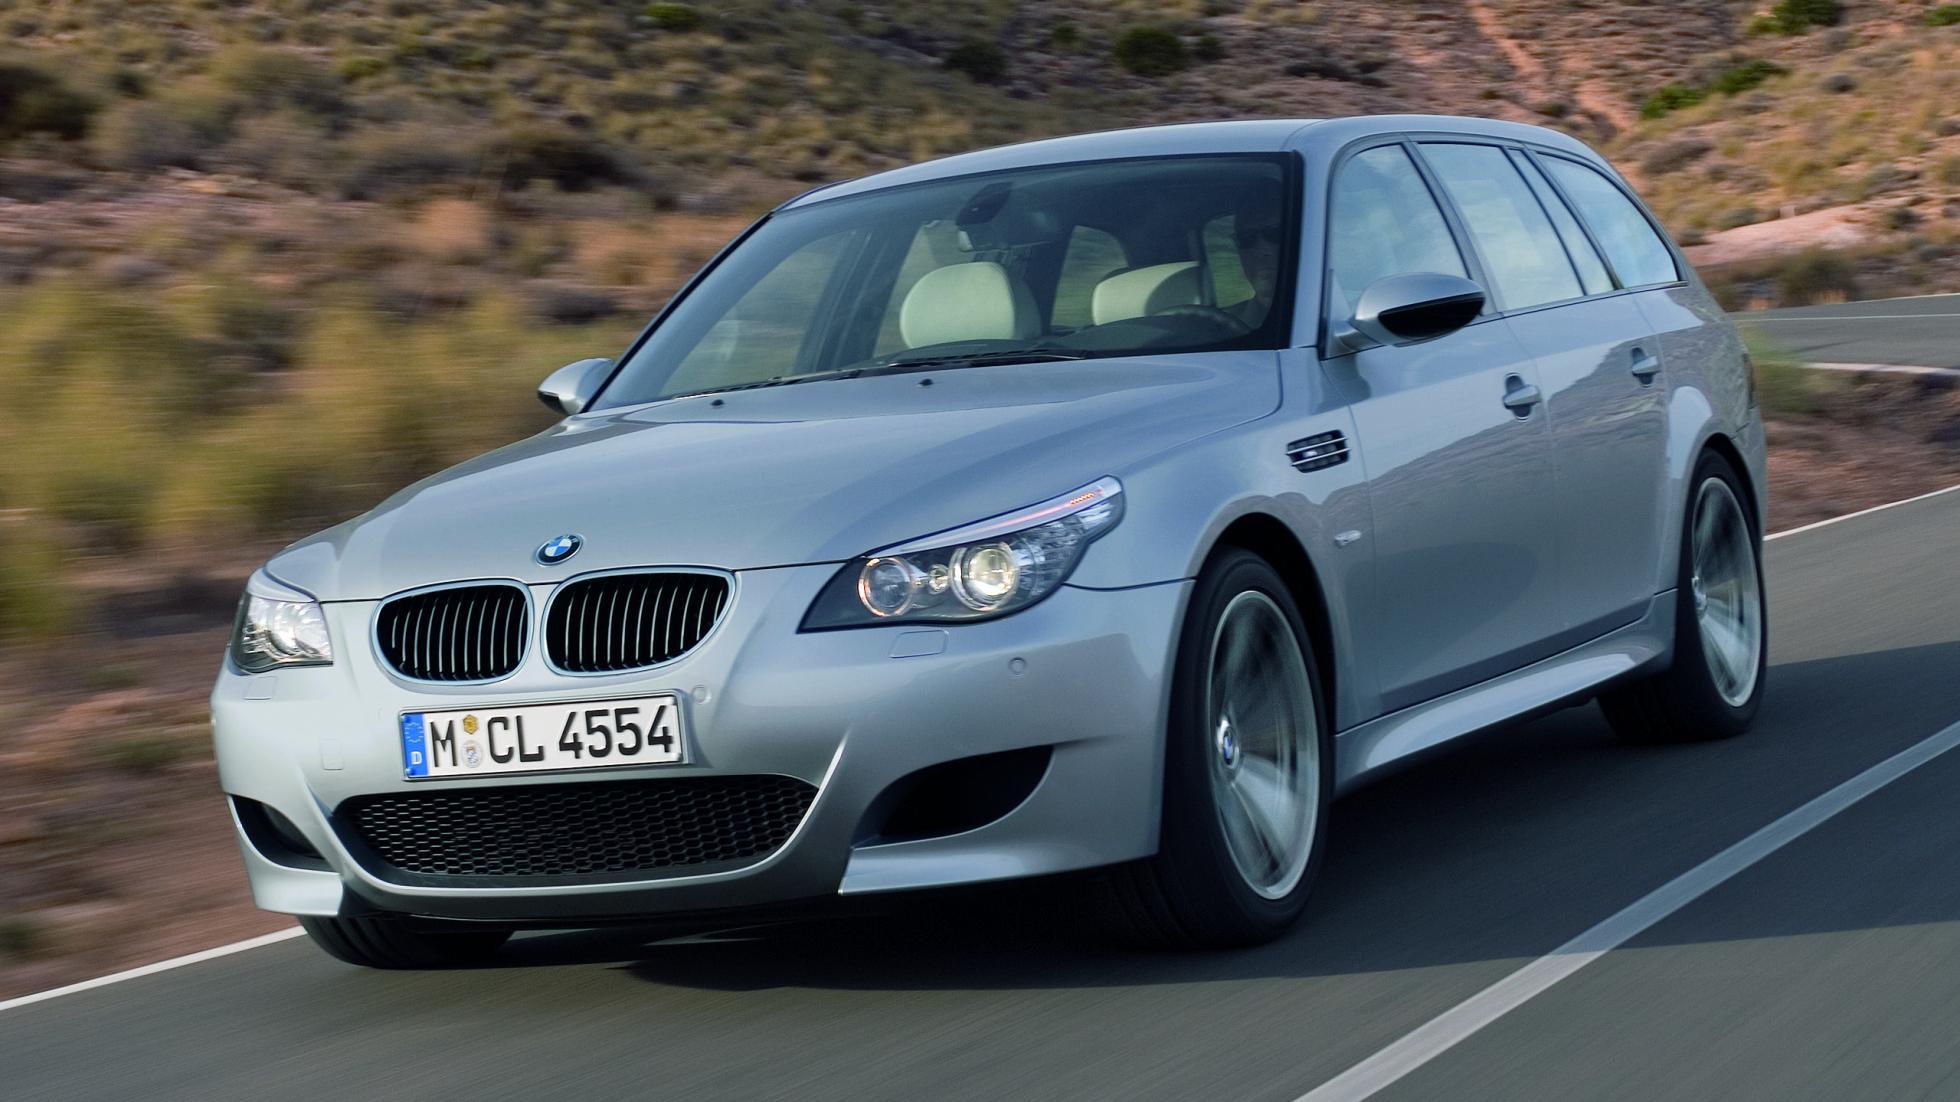 Zanimljivost dana: BMW M5 Touring sa V10 motorom